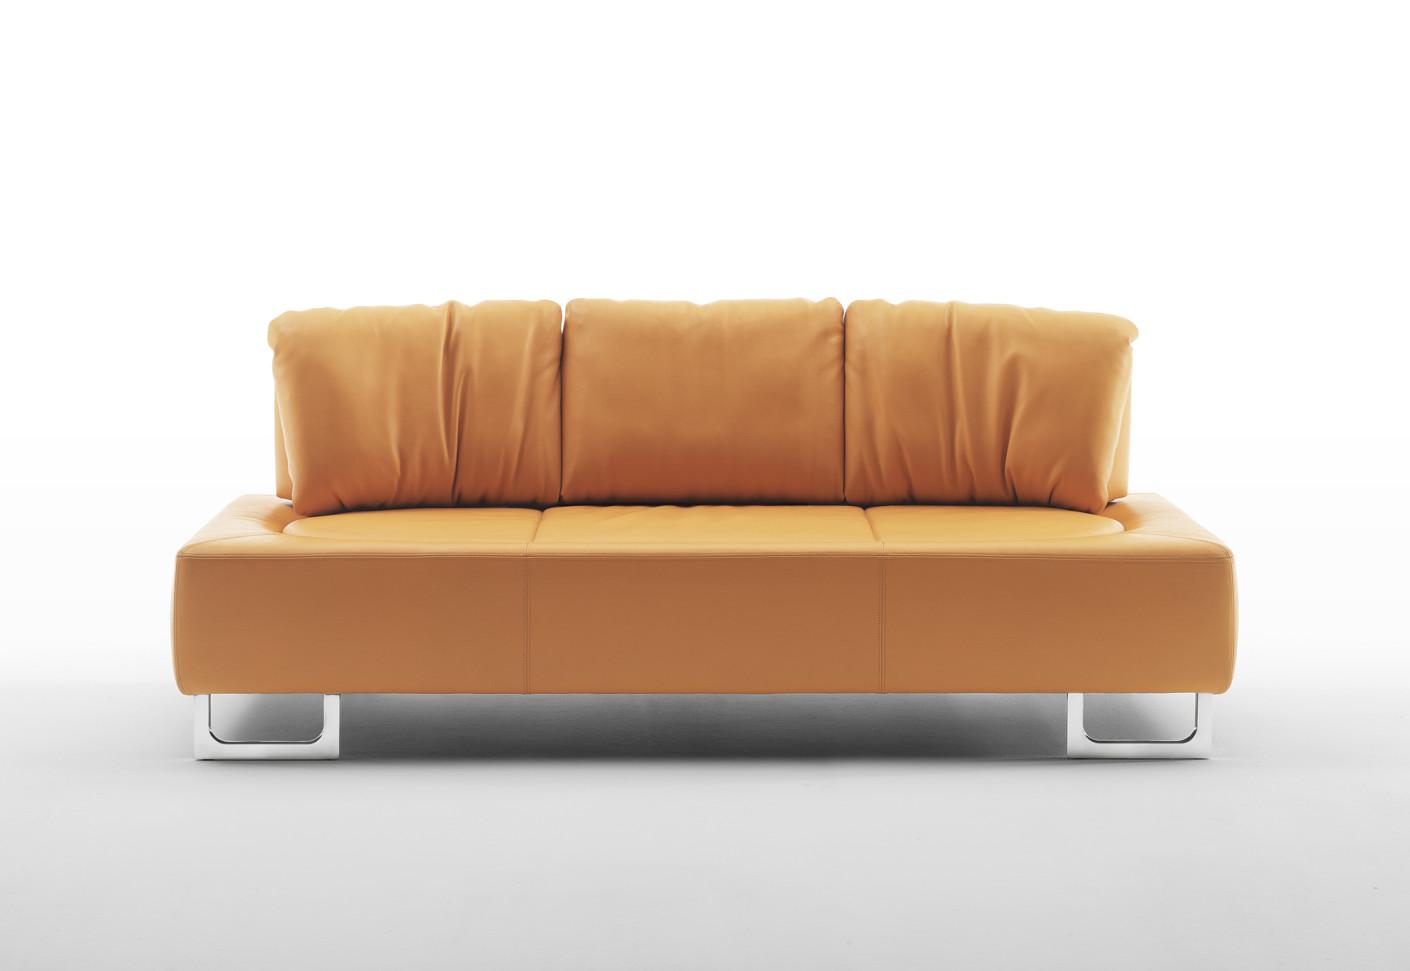 Ds 165 sofa von de sede stylepark for Sitzlandschaft sofa